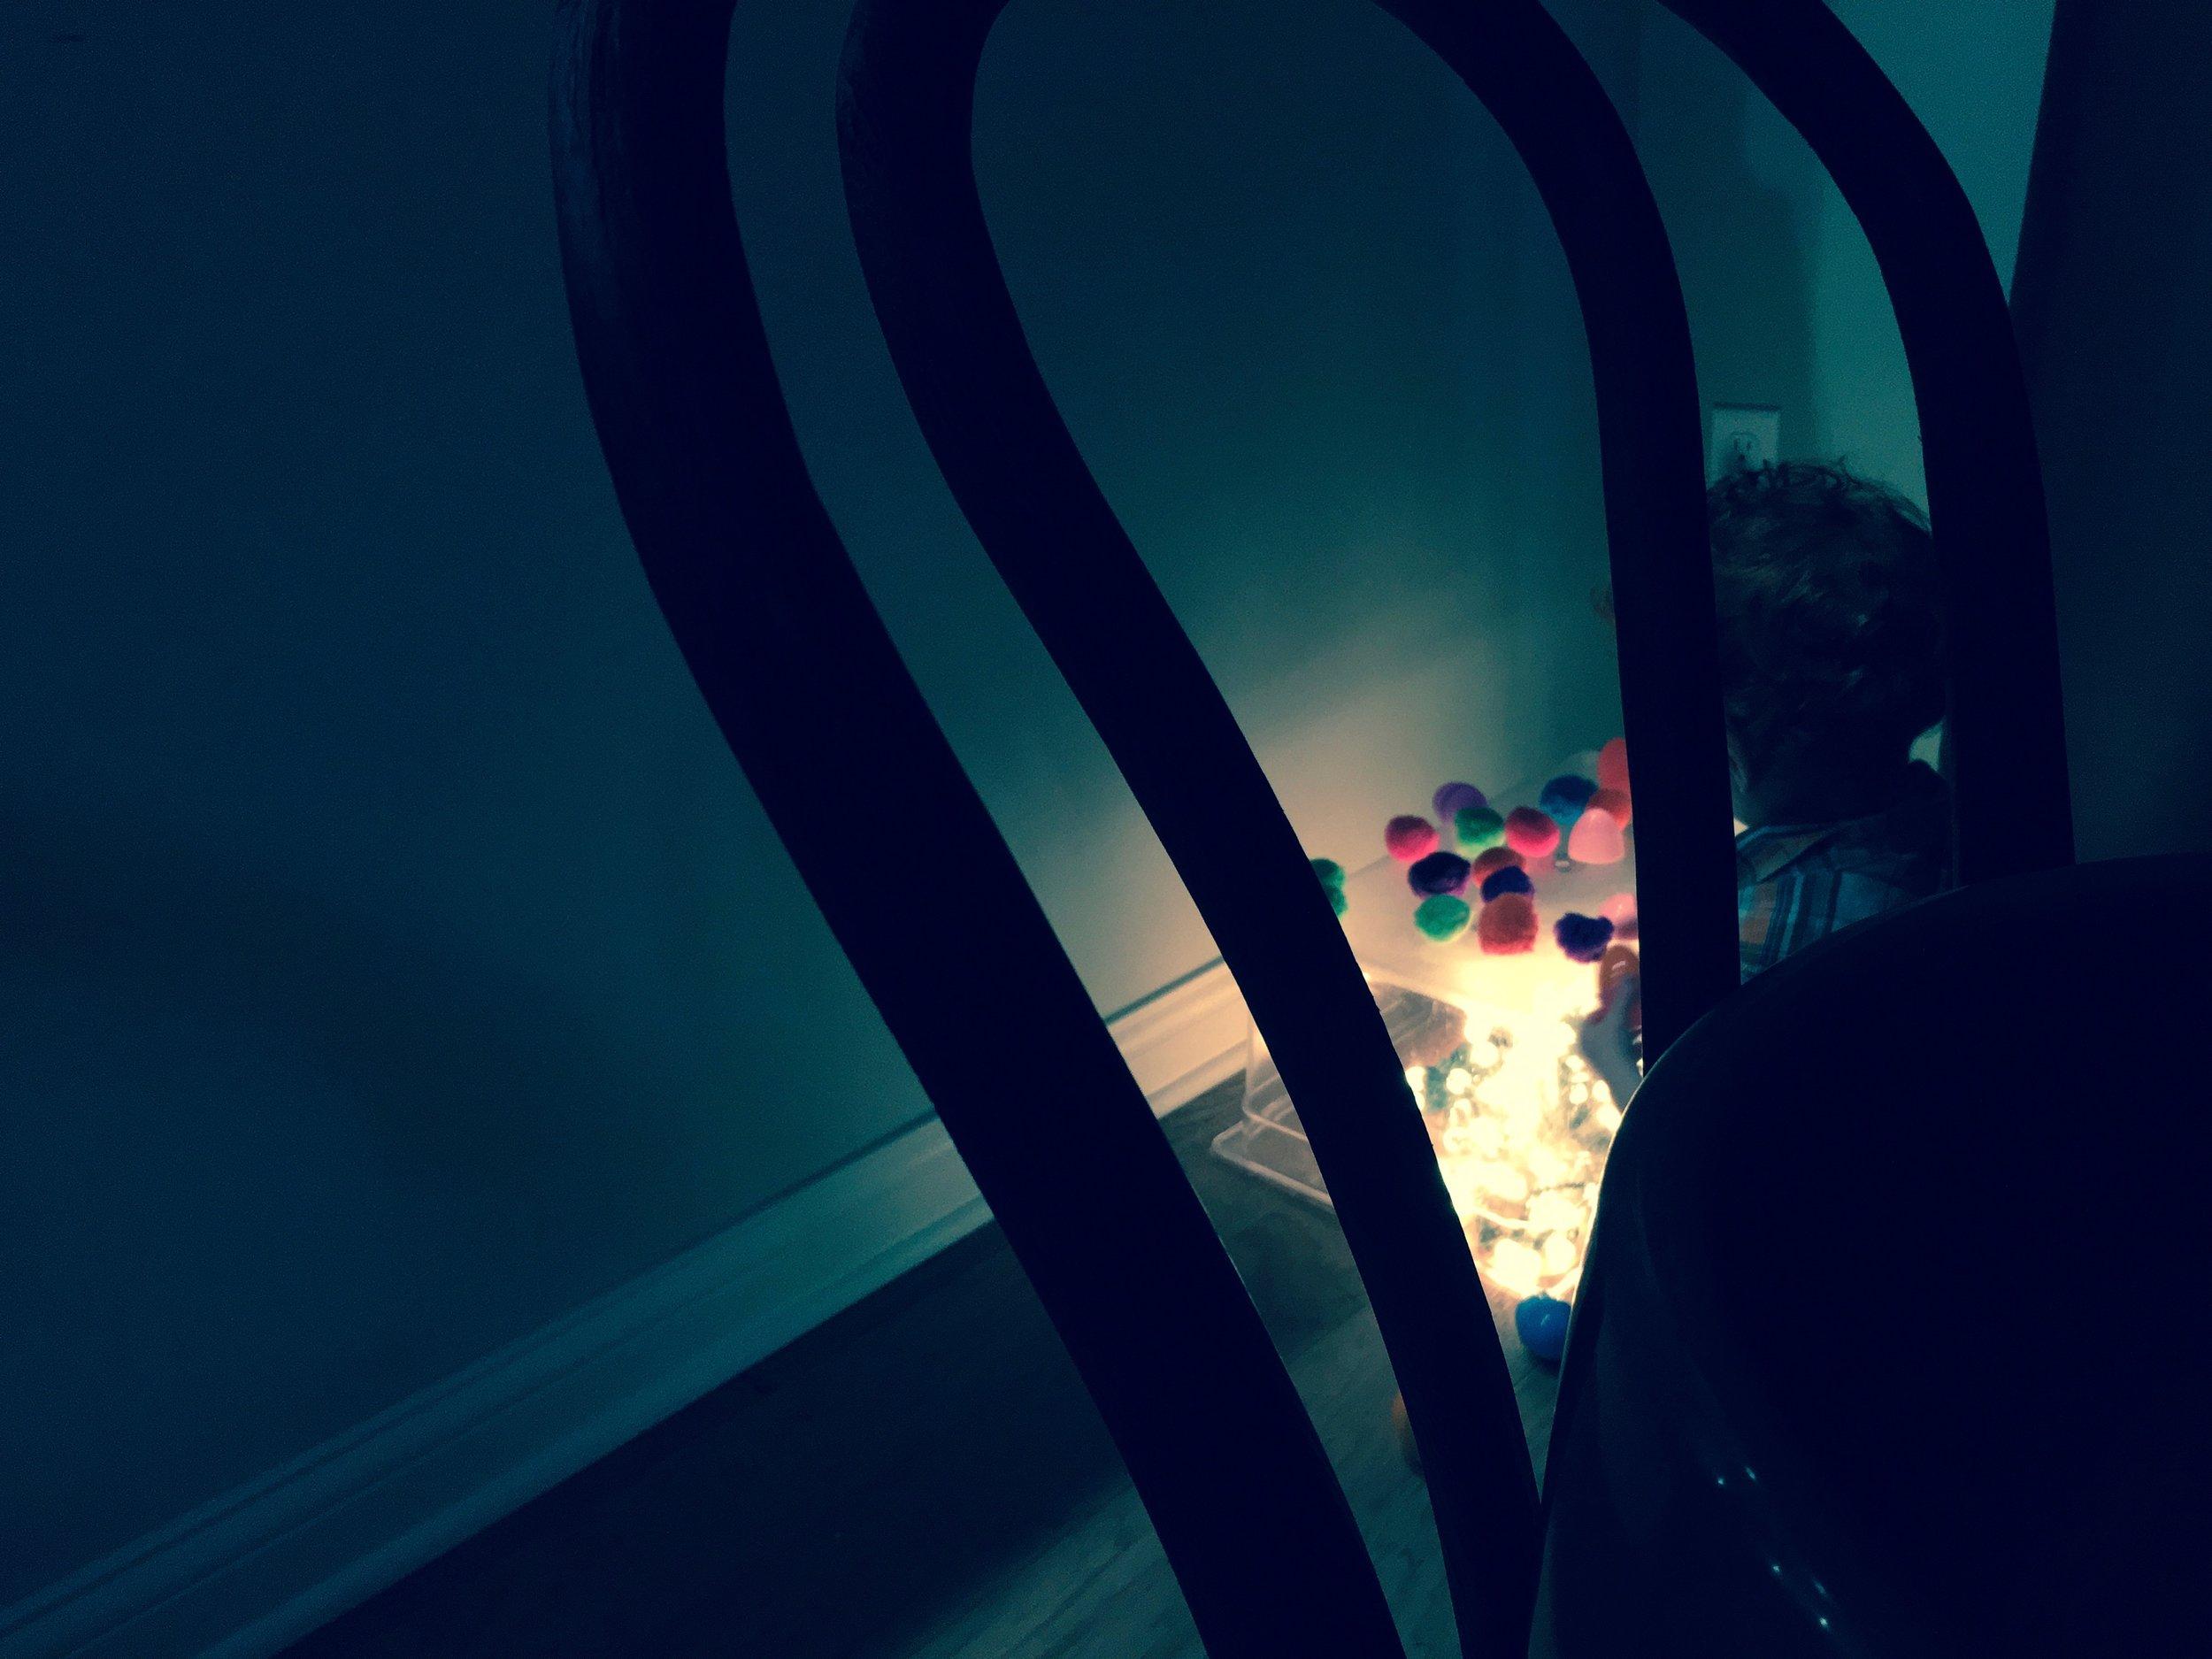 A light table makes for mood lighting and kid distracting.